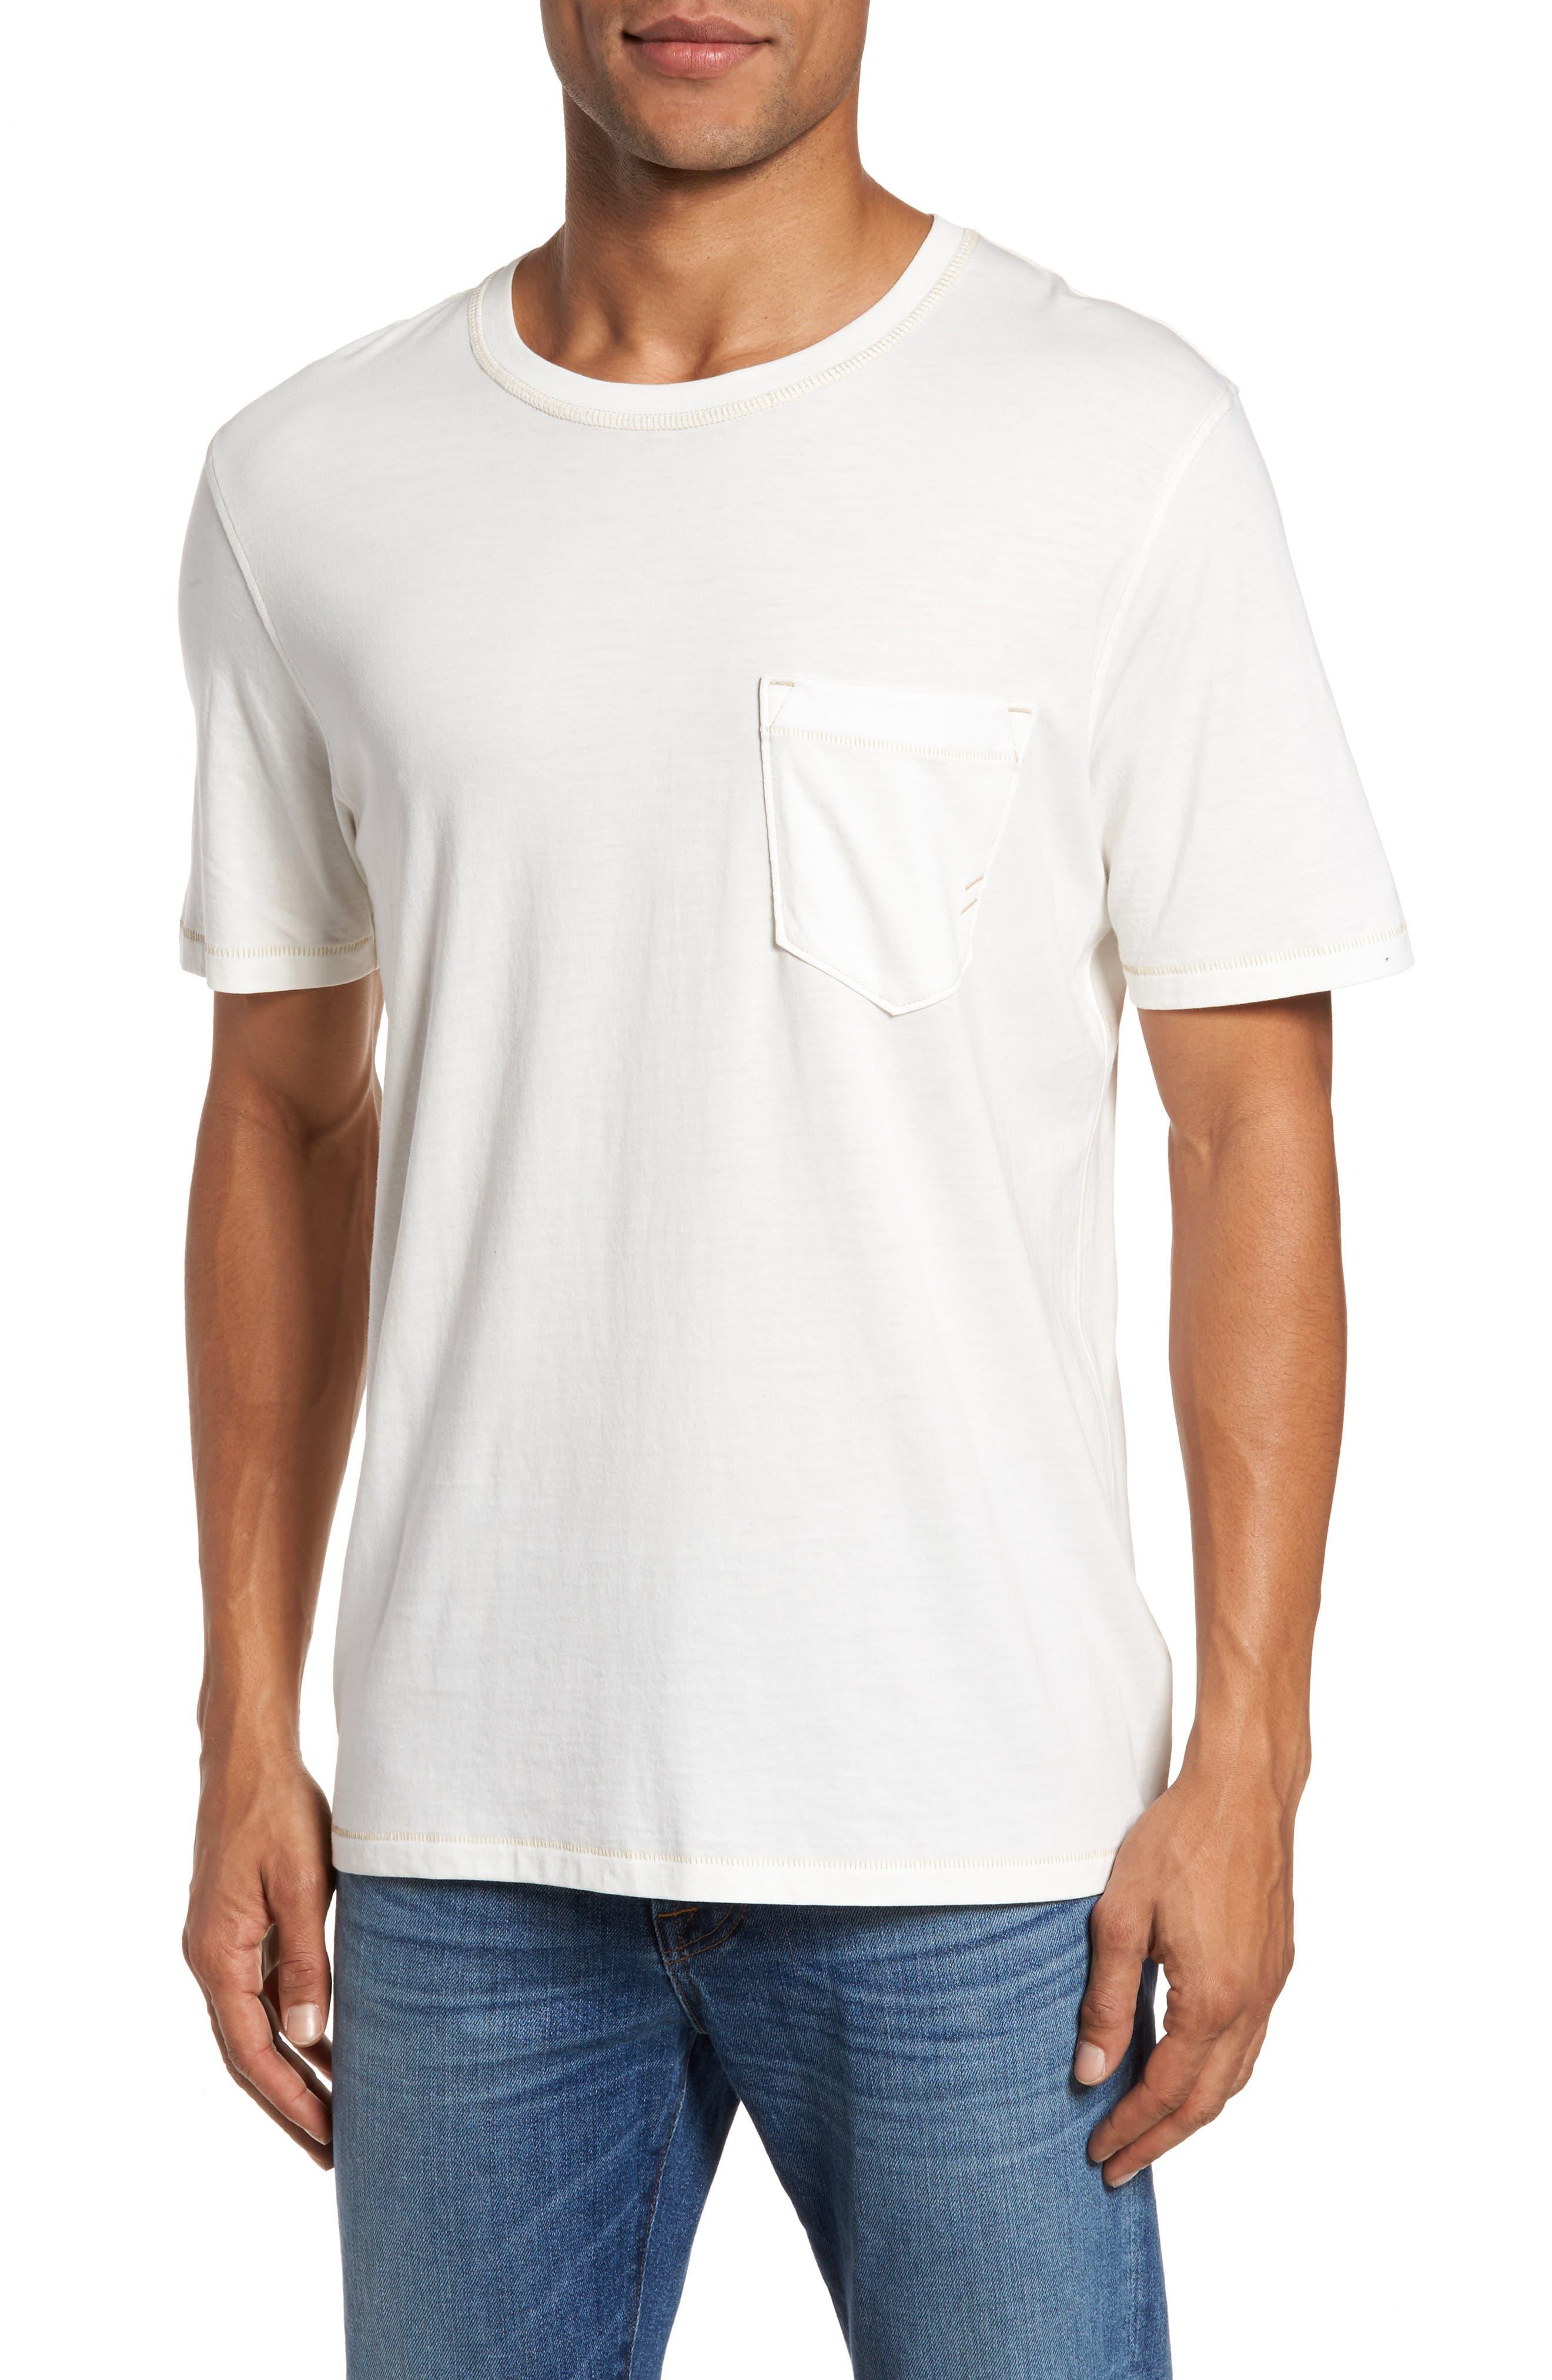 Alternate Image 1 Selected - Billy Reid Crewneck T-Shirt